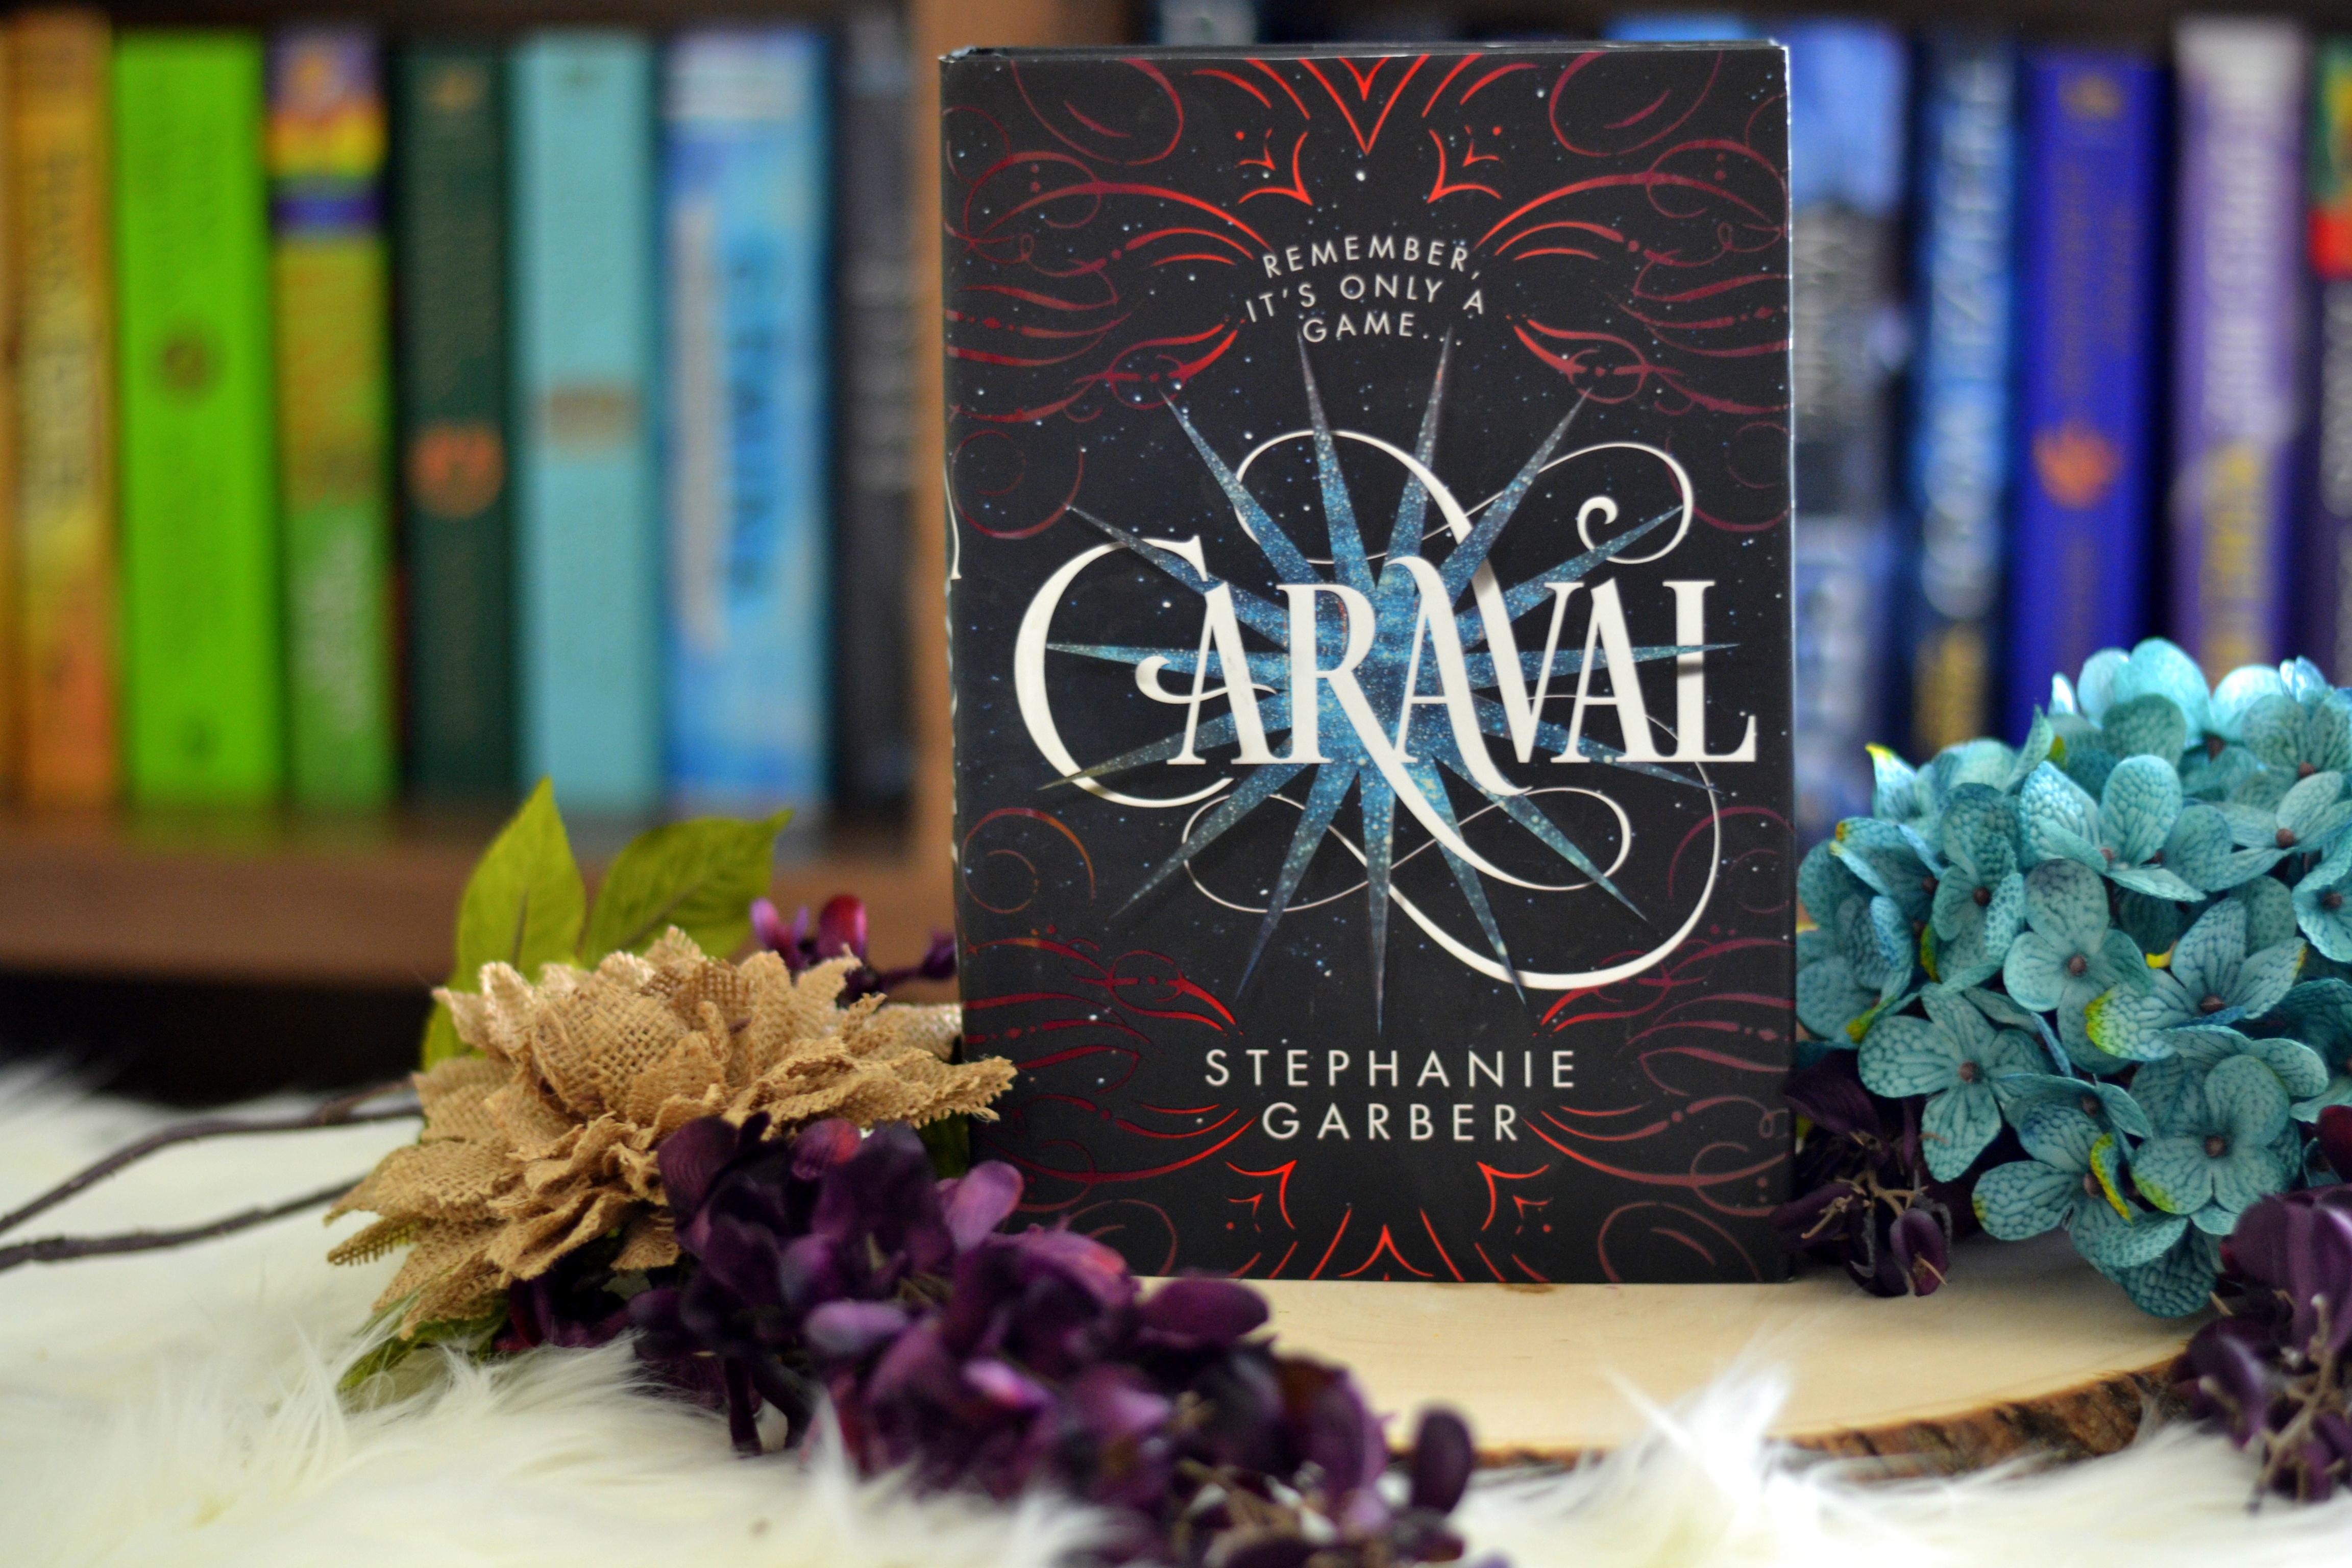 Caraval by Stephanie Garber | Review